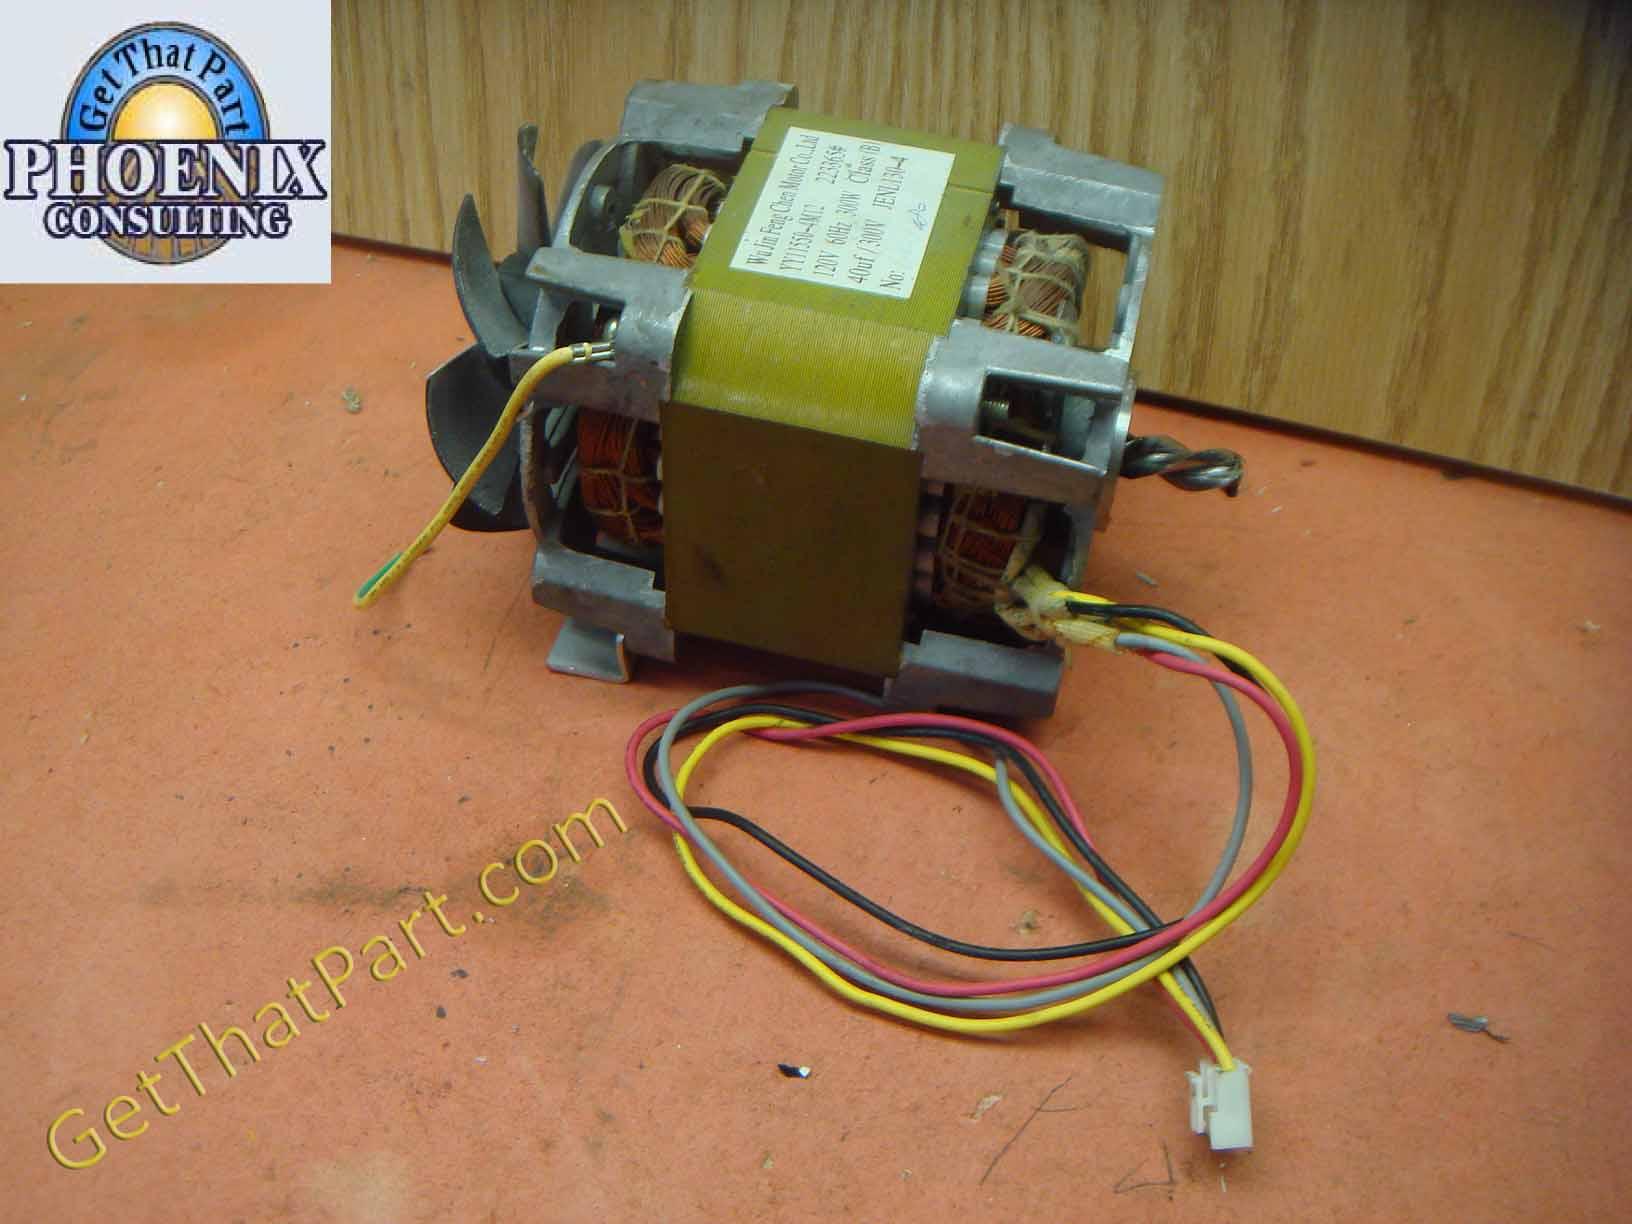 Shredder Replacement Parts : Fellowes sb c paper shredder main motor assembly